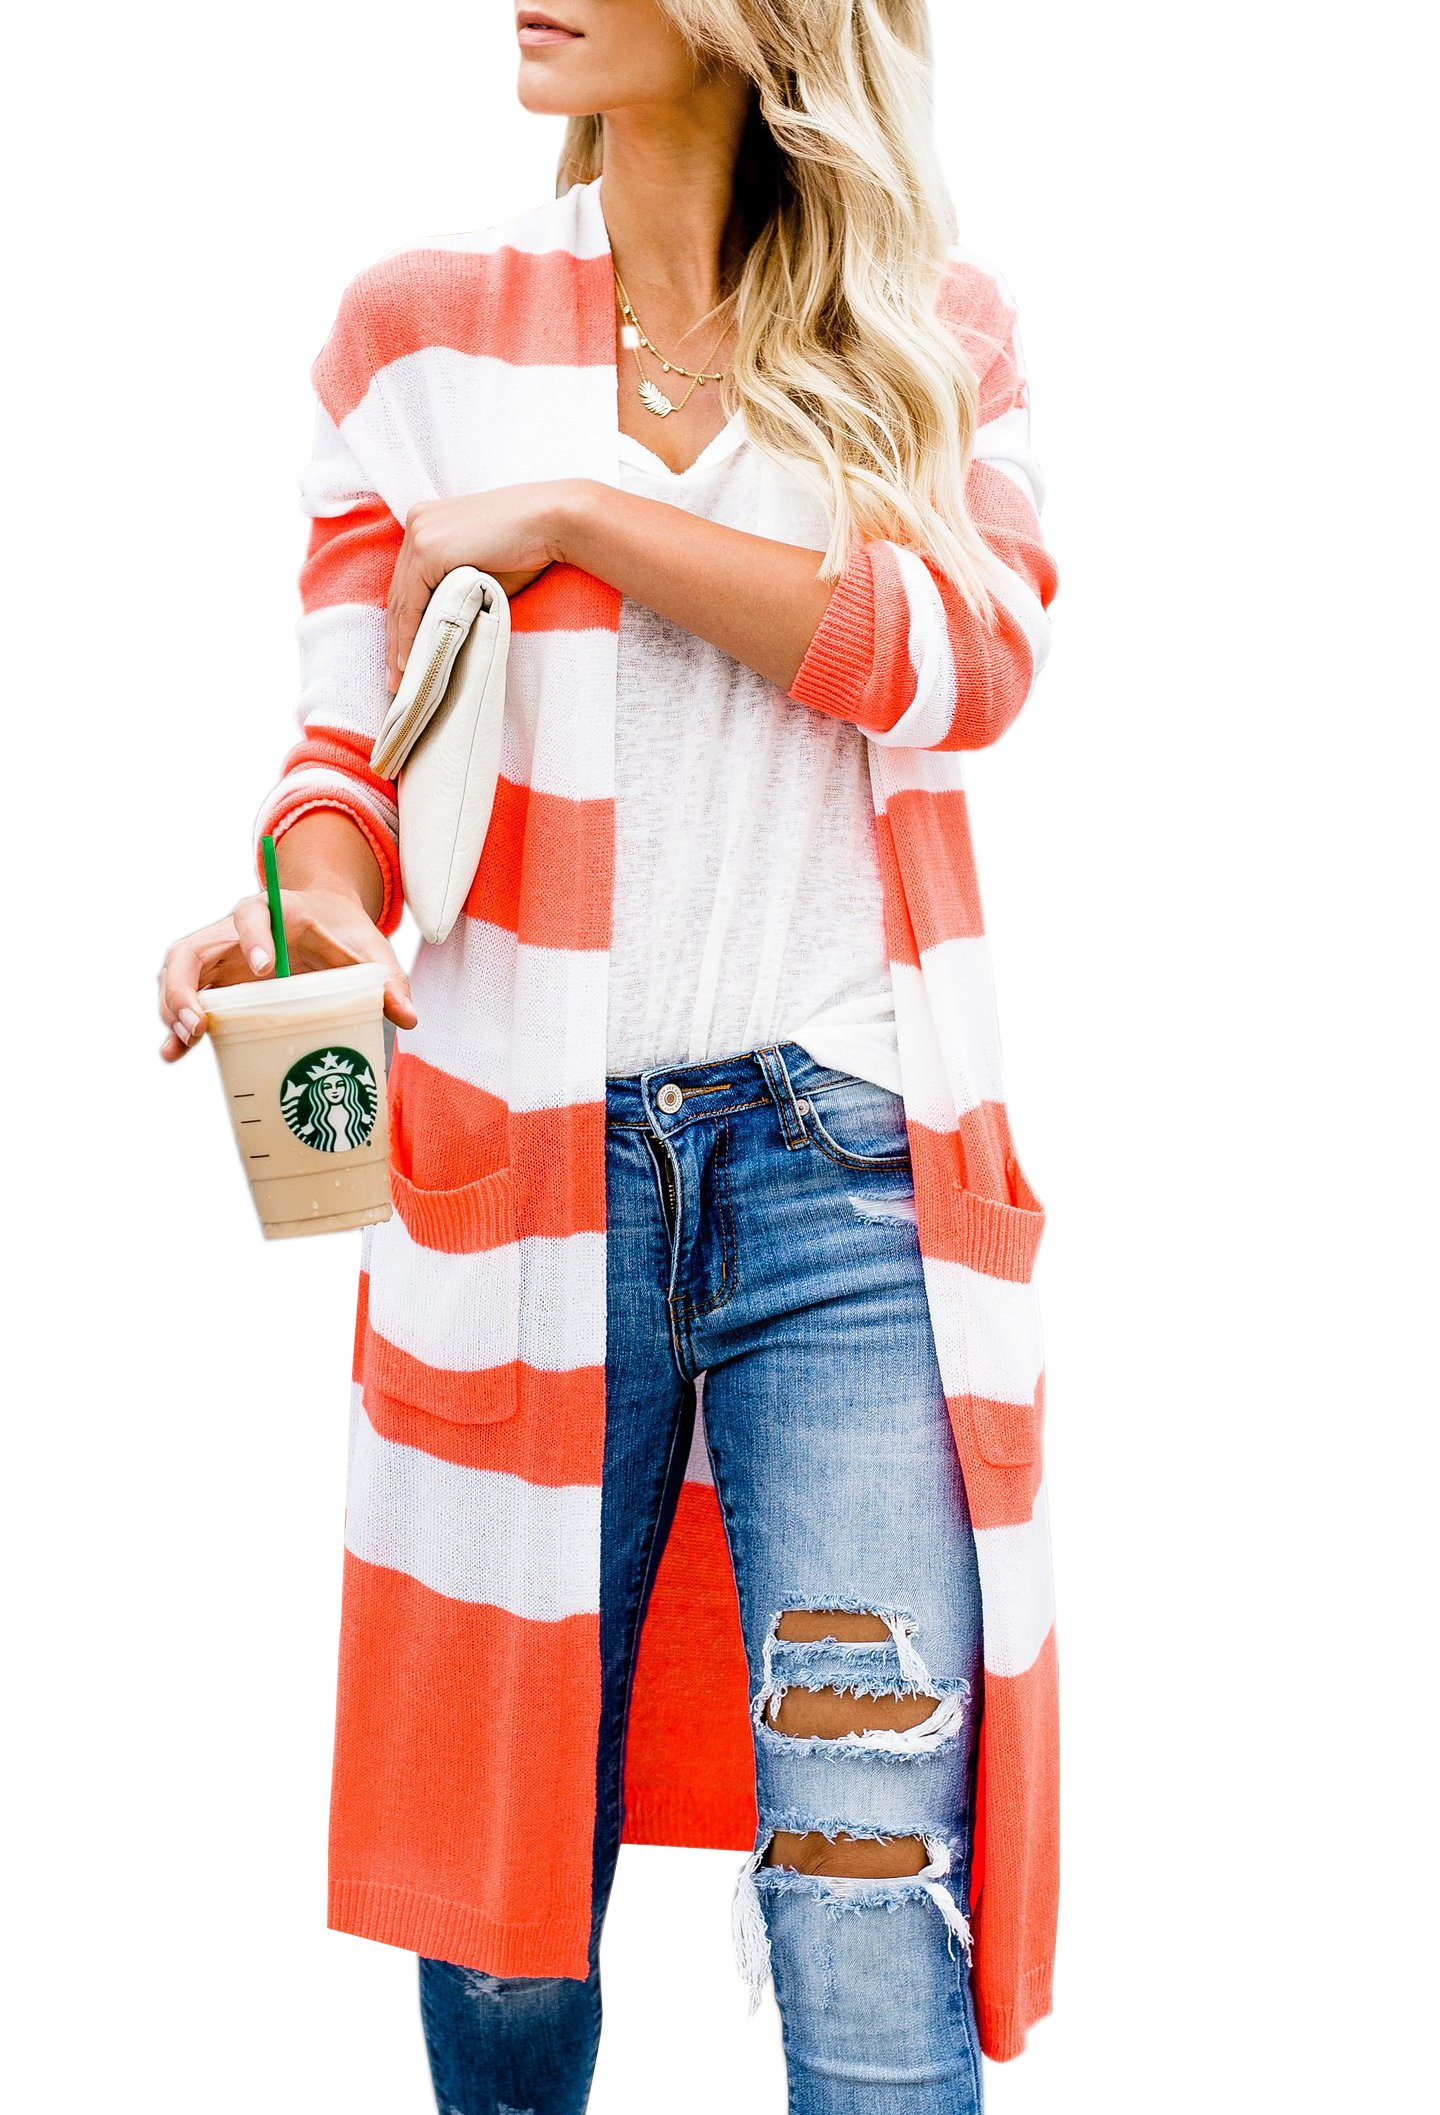 Niitawm Womens Casual Striped Pockets Cardigans Long Sleeve Knit Lightweight Open Front Cardigan Sweater (M, Orange)